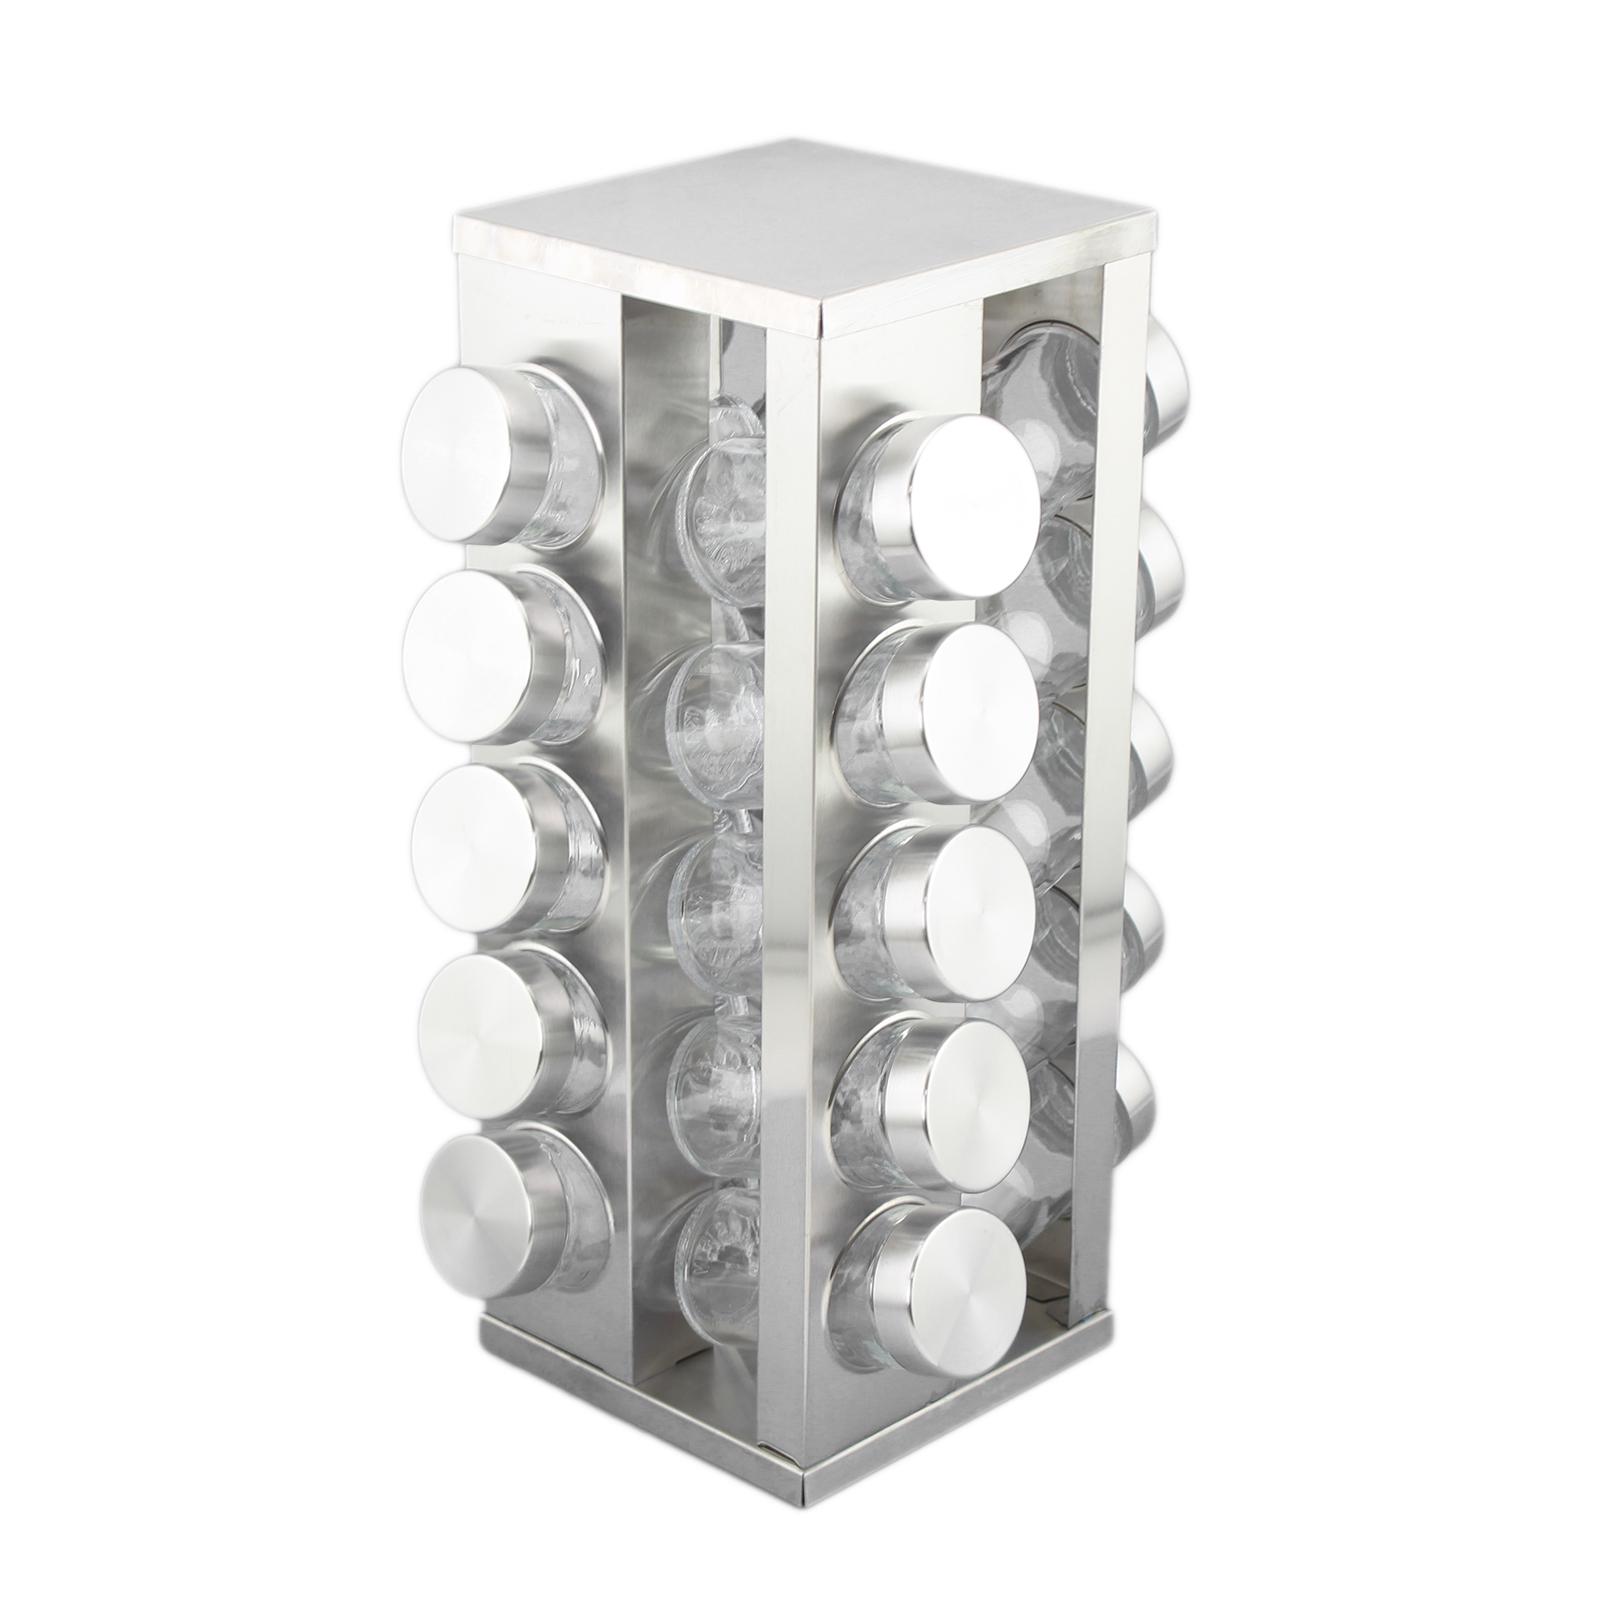 Square revolving stainless steel spice tower rack carousel set